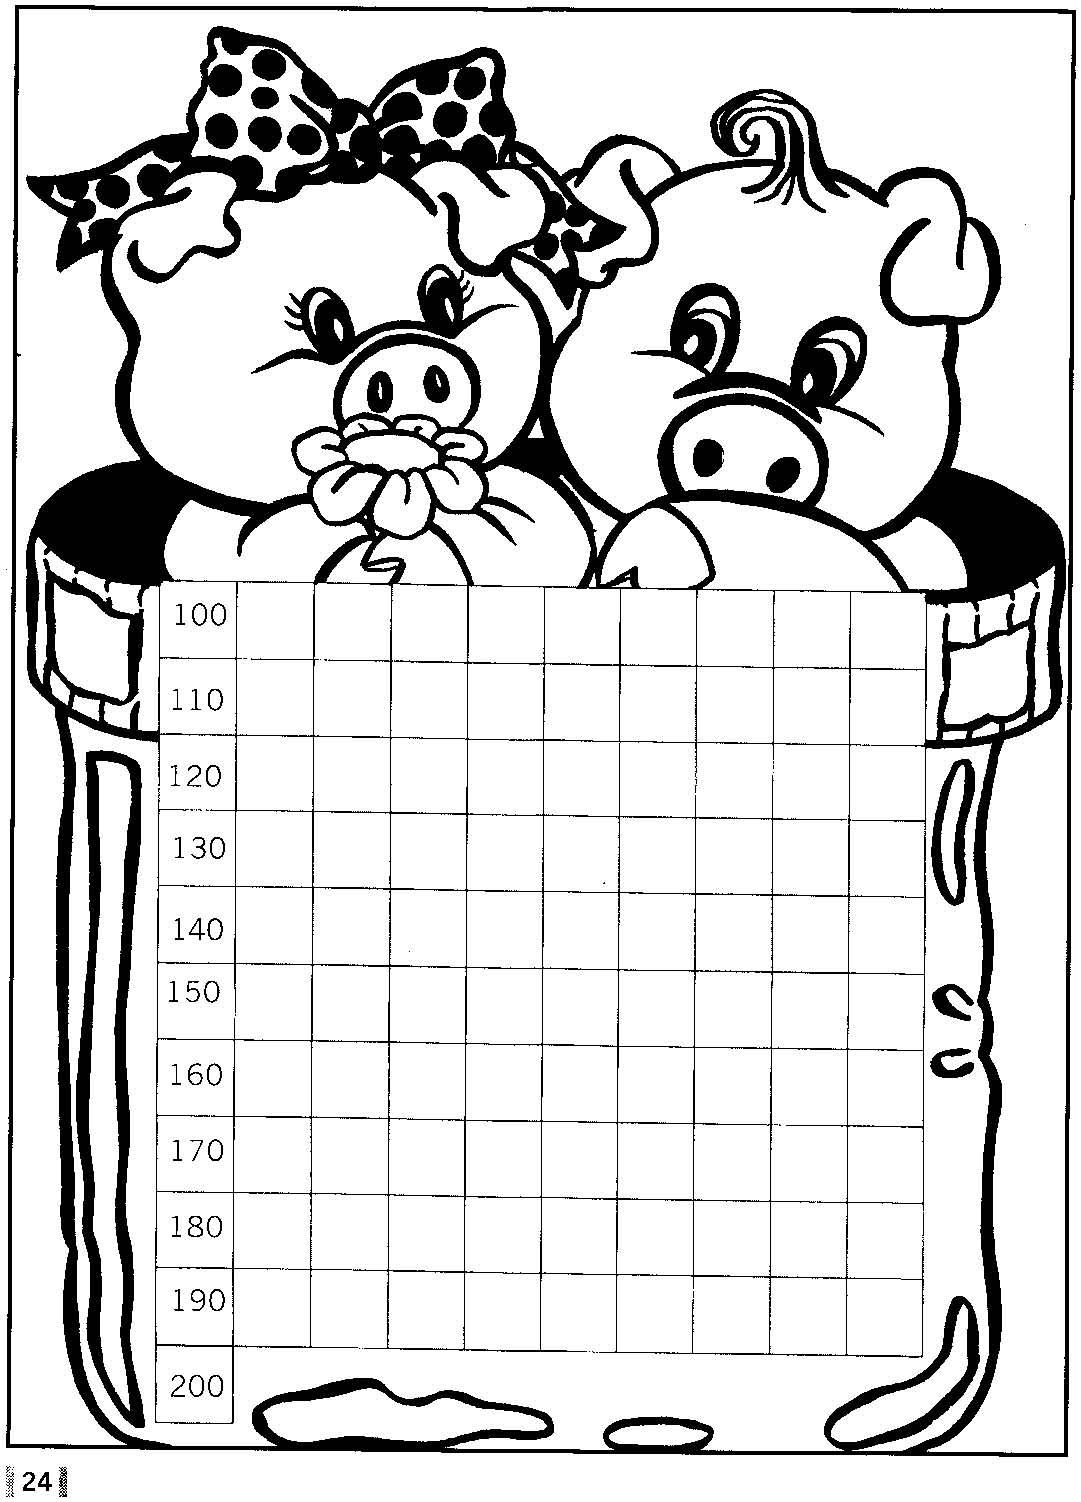 Marlarte: Sequência numérica... 100, 200 e 300.